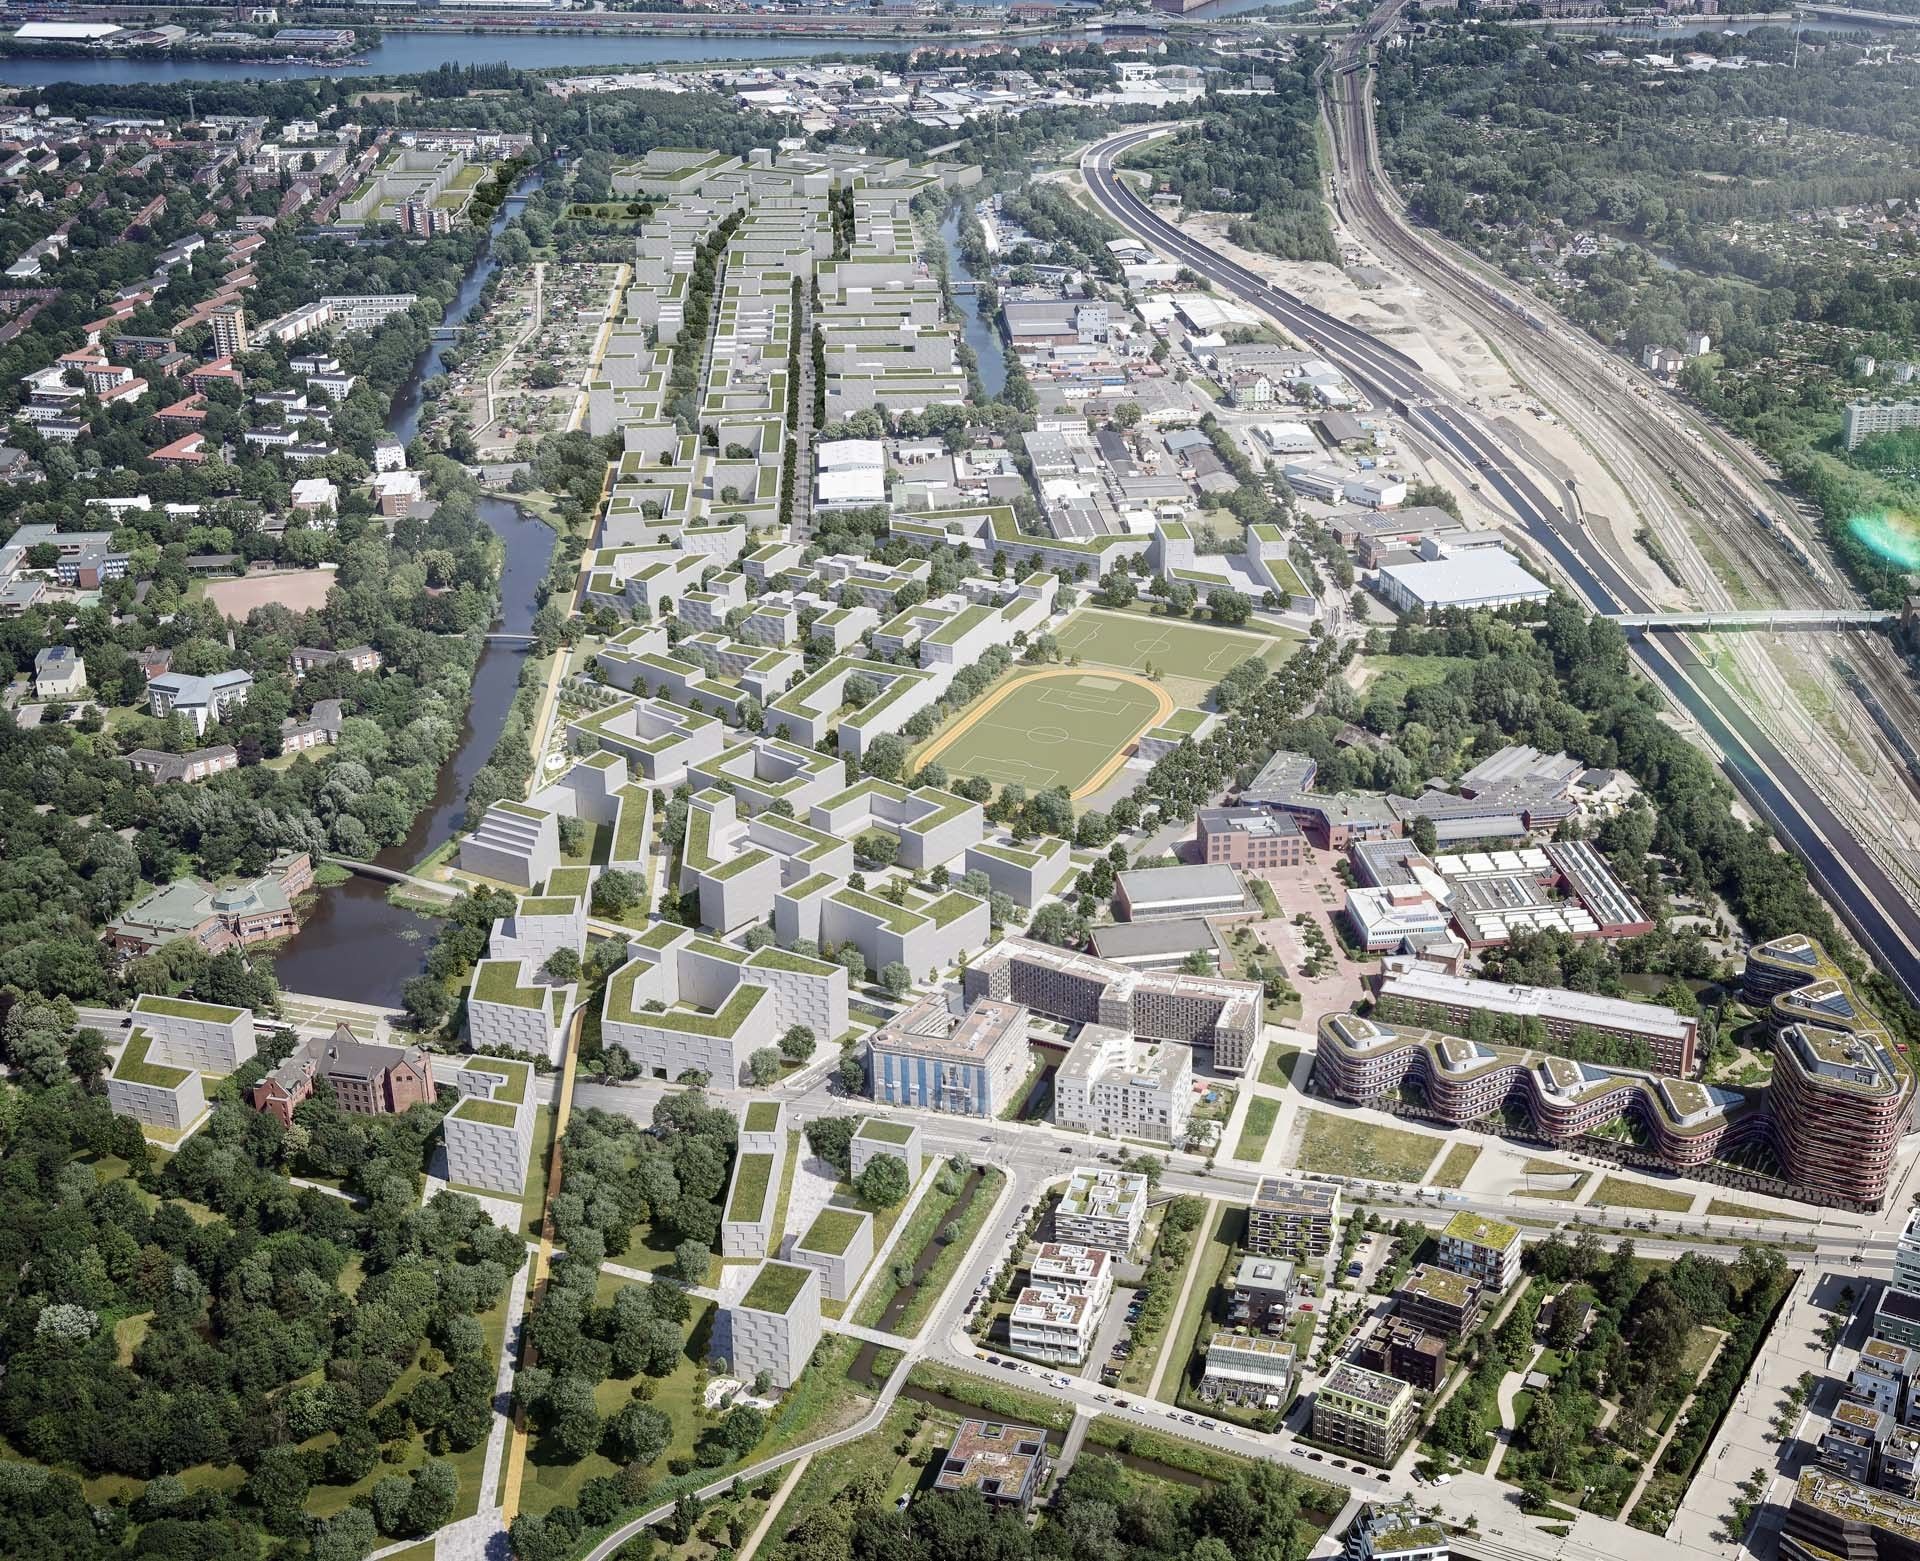 IBA Hamburg GmbH / mokka studios; Kartengrundlage: Falcon Crest Air